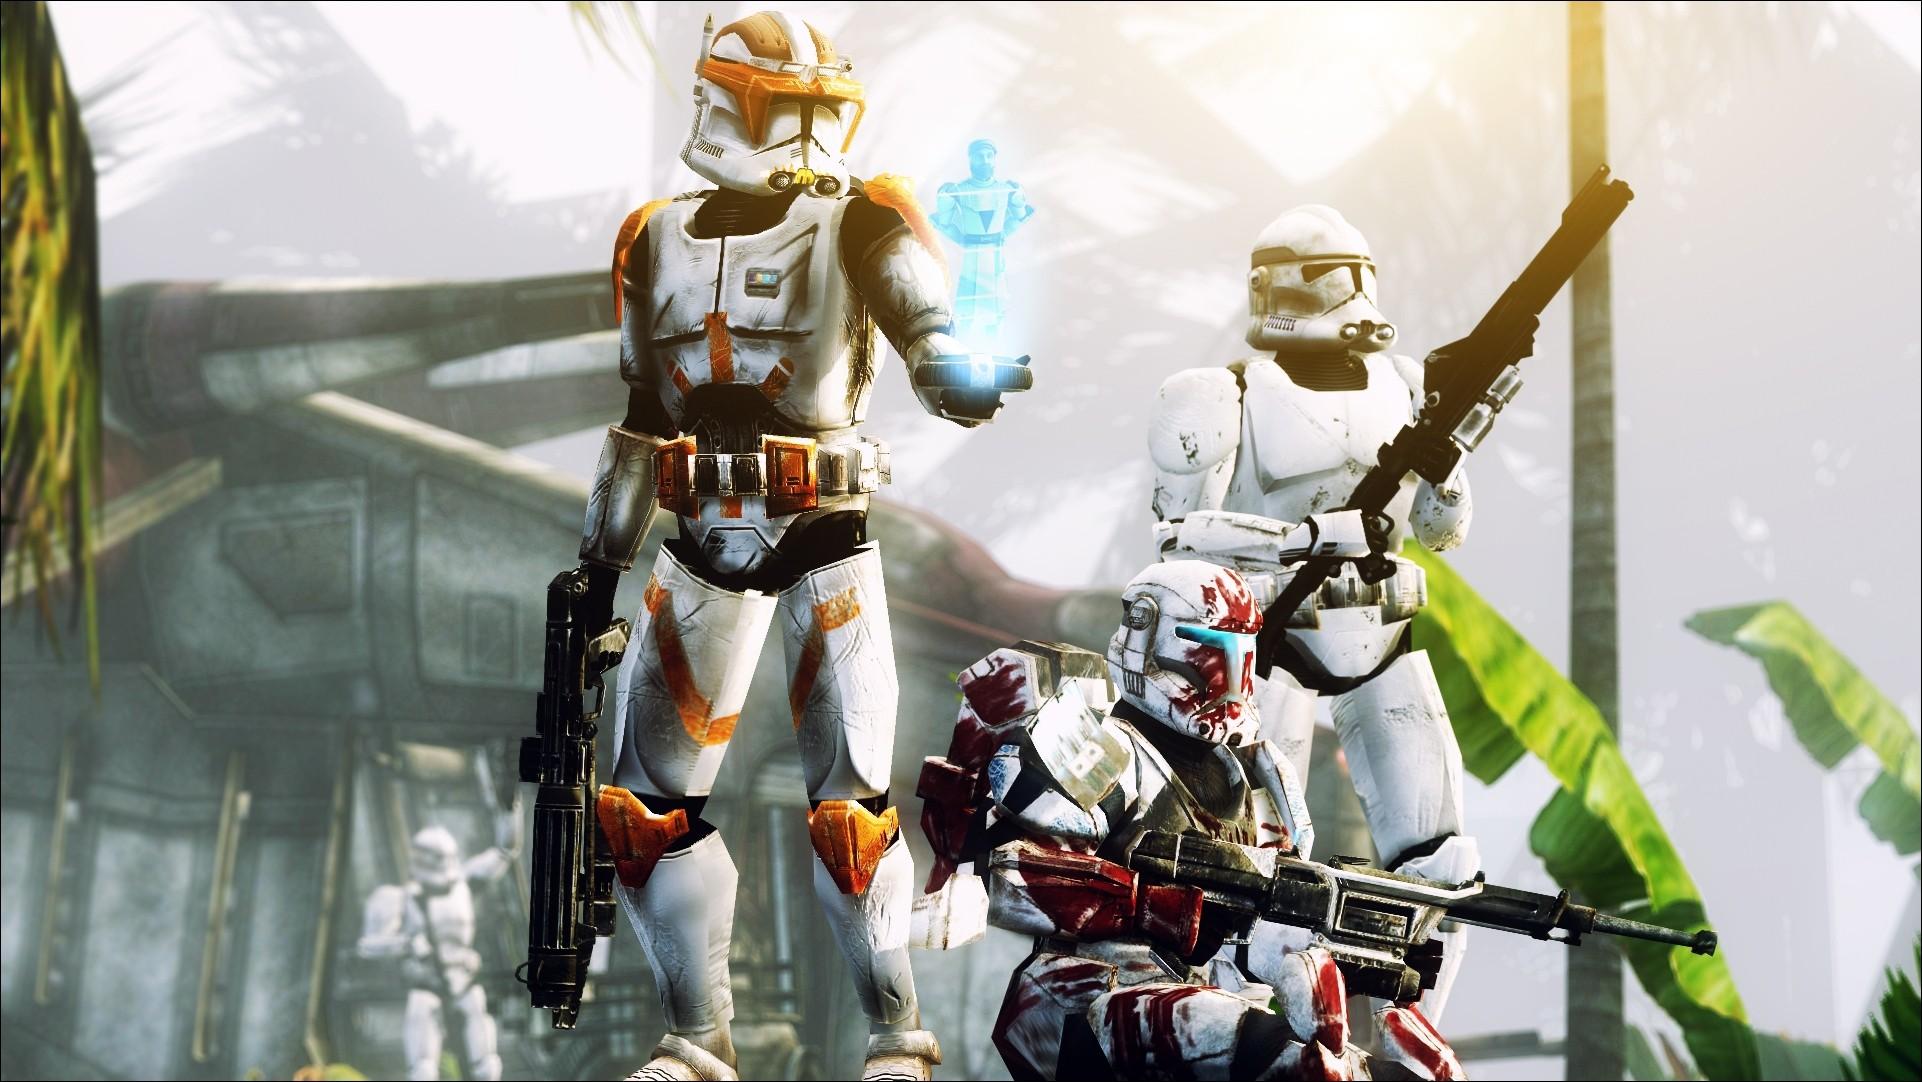 Clone Wars Star Wars wallpaper other Wallpaper Better 1922x1082